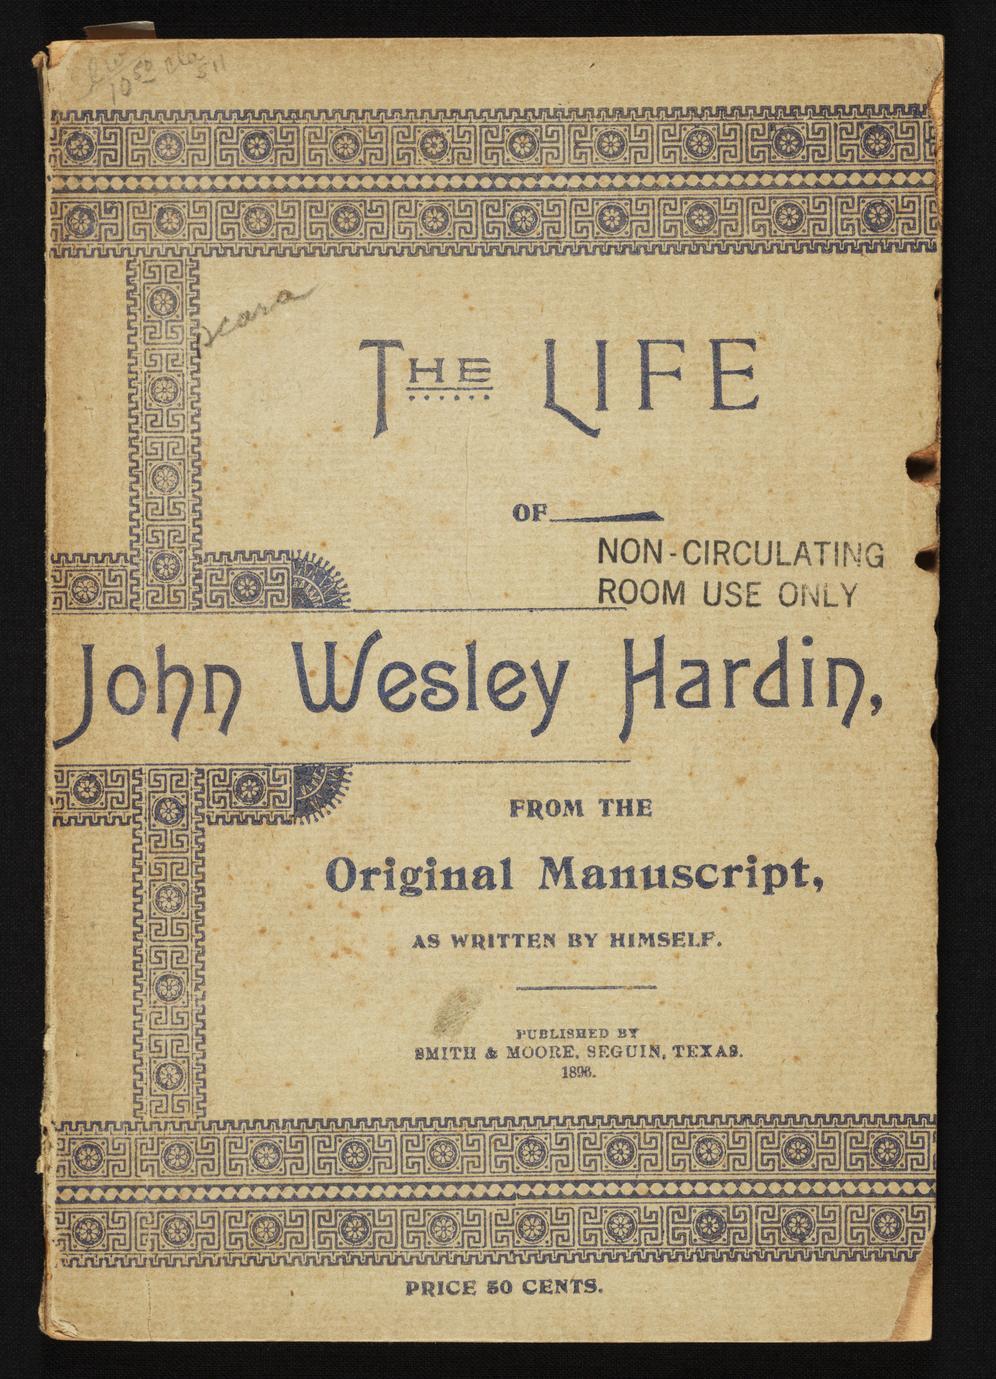 The life of John Wesley Hardin (1 of 4)